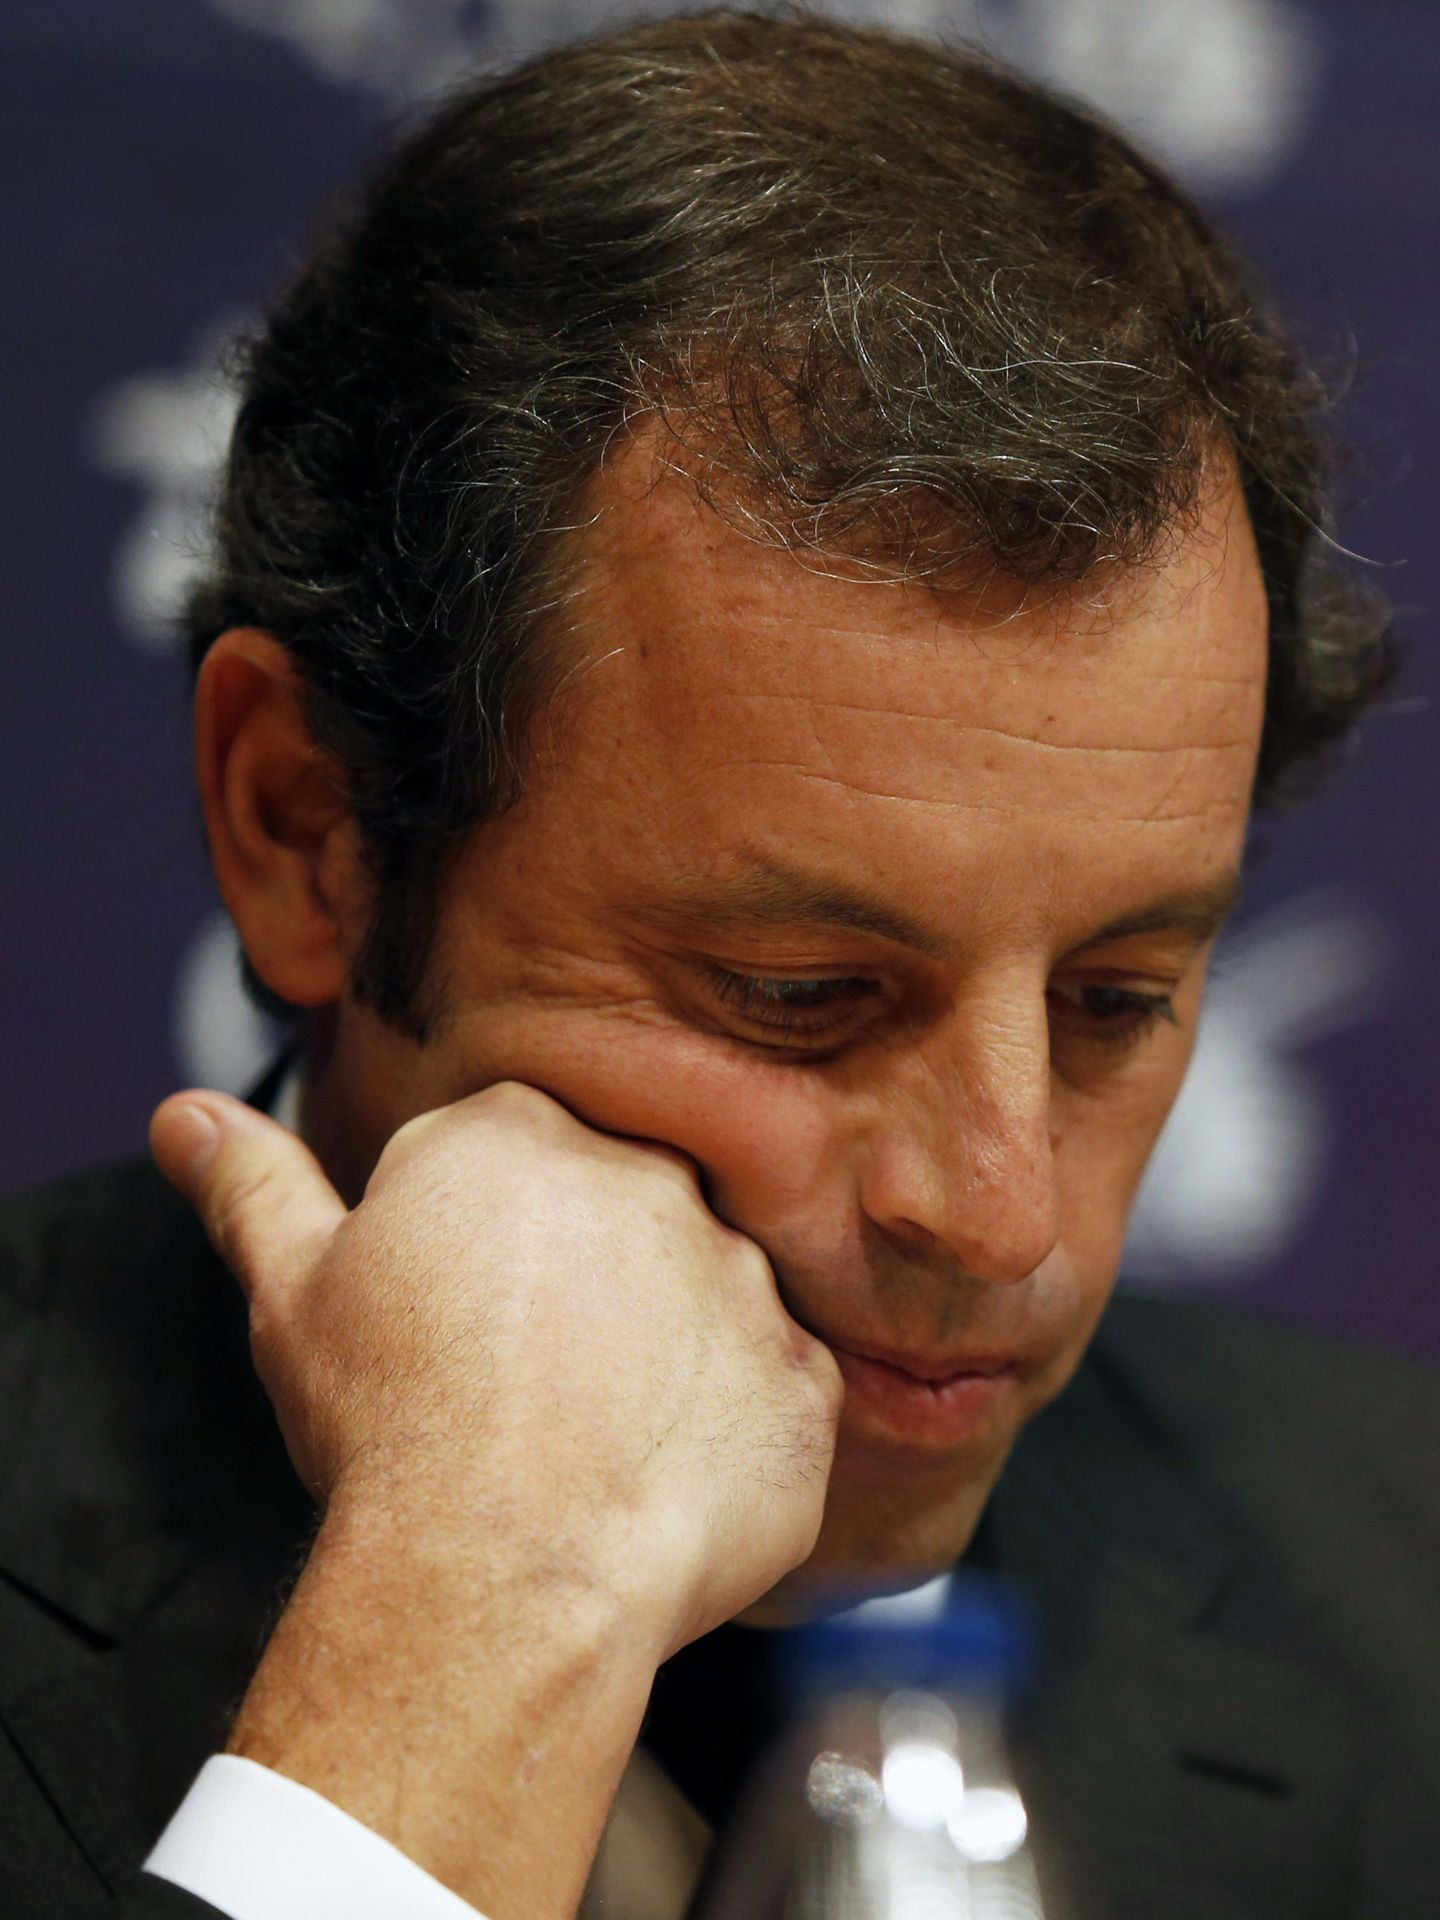 Sandro rosell presenta la dimisión como presidente del fc barcelona